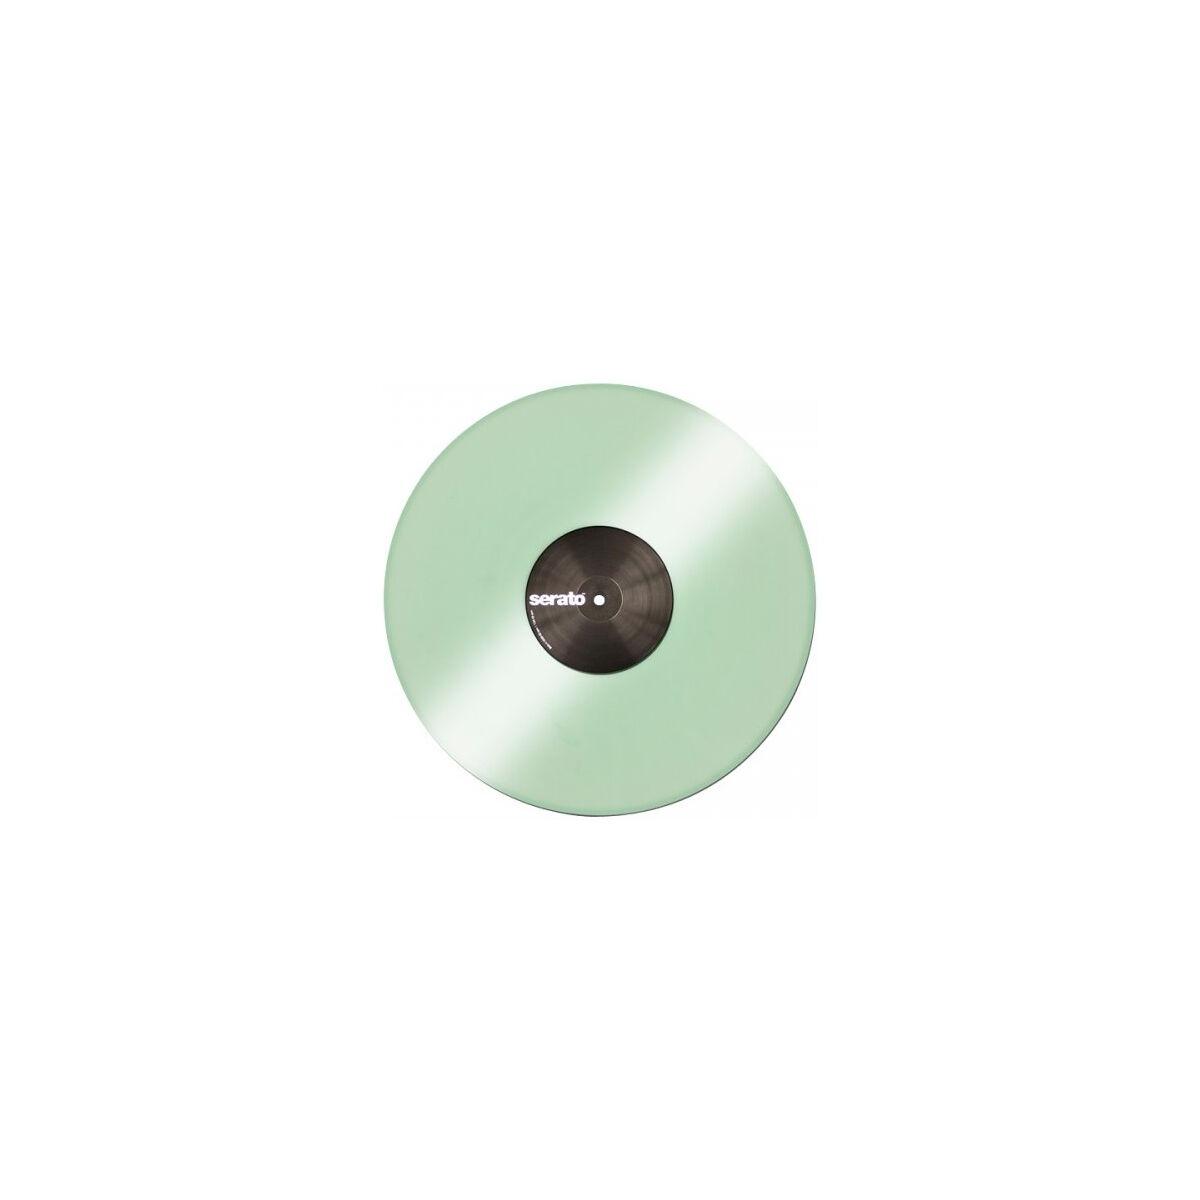 Serato Paire Vinyl Glow in the dark 12